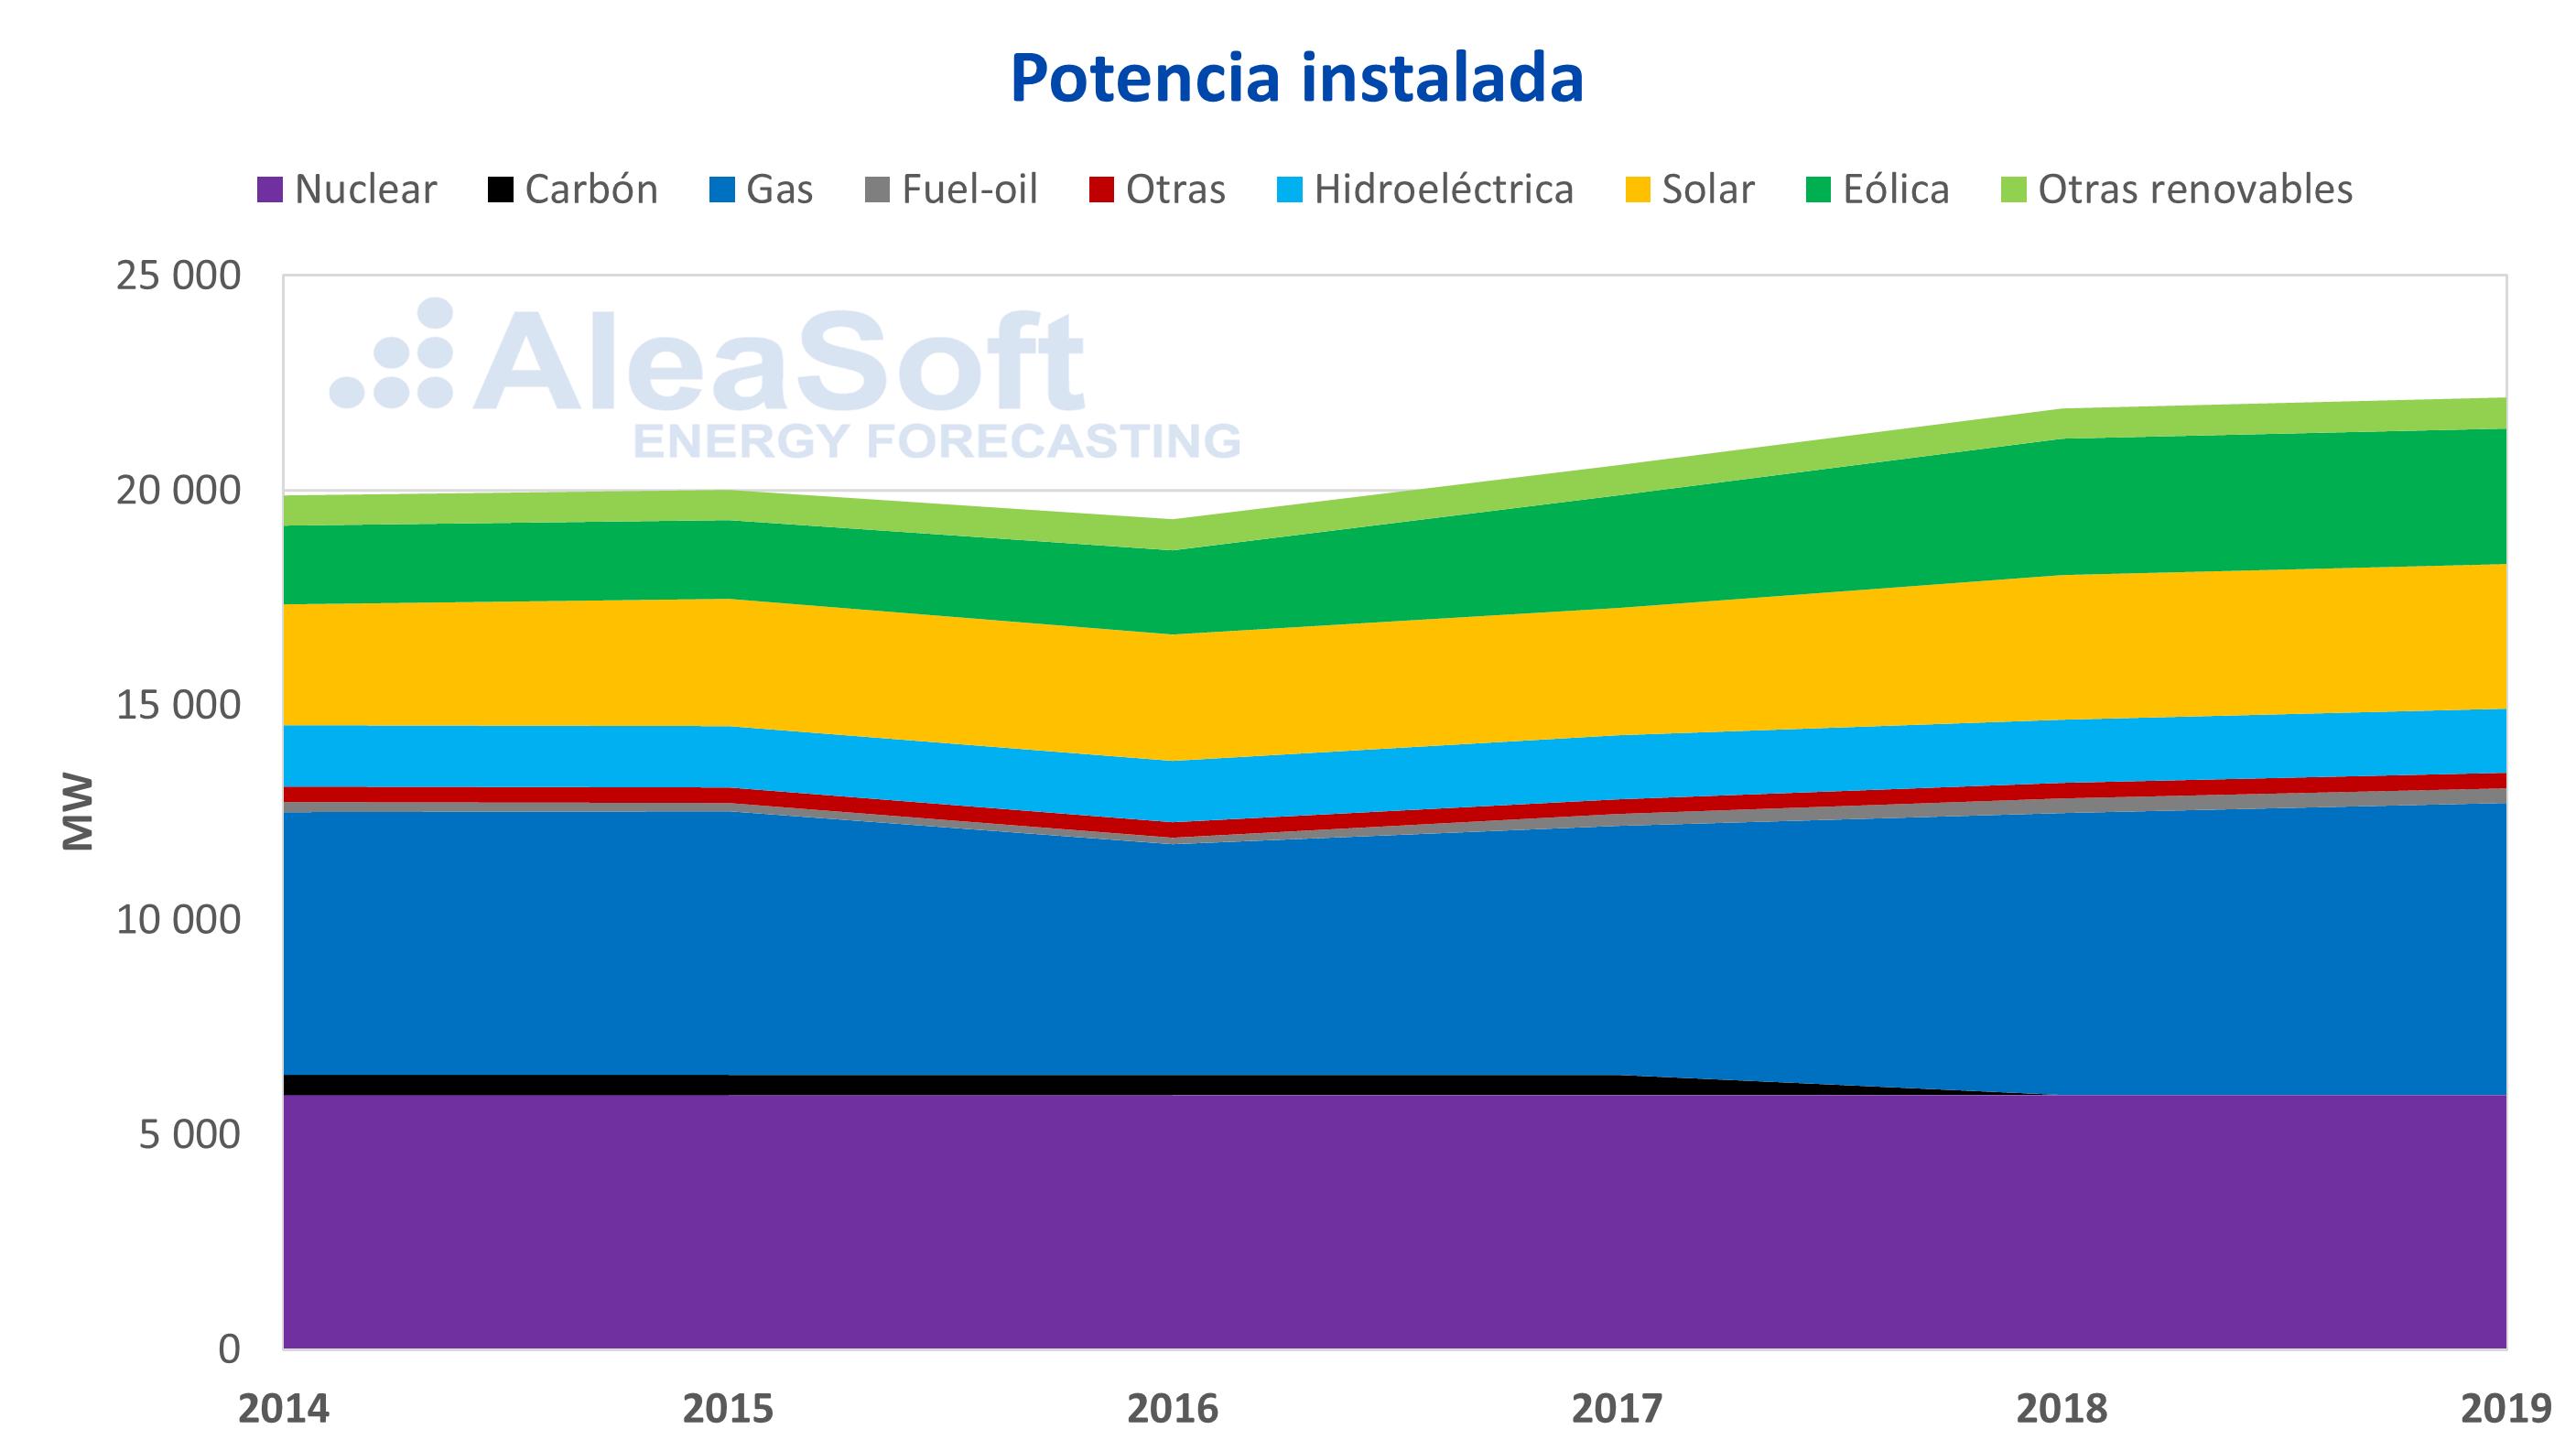 AleaSoft - Belgica potencia instalada